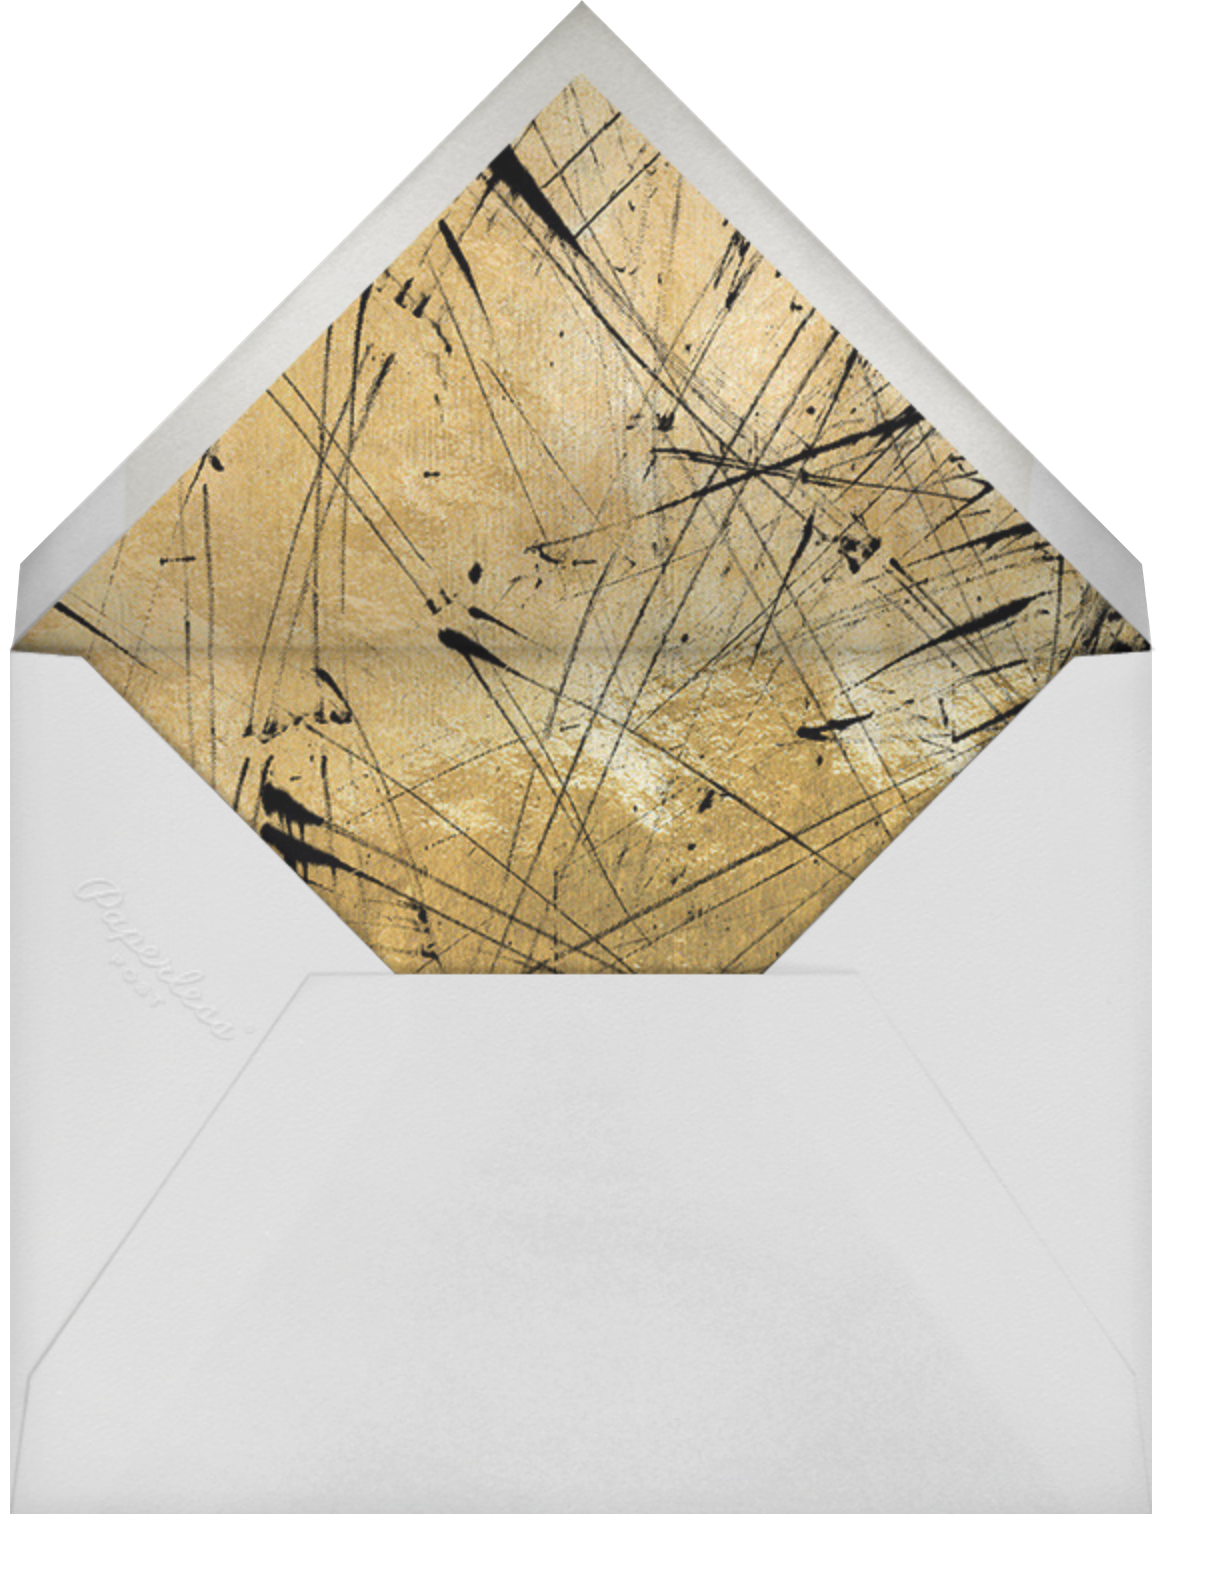 Atelier - Kelly Wearstler - Bachelorette party - envelope back